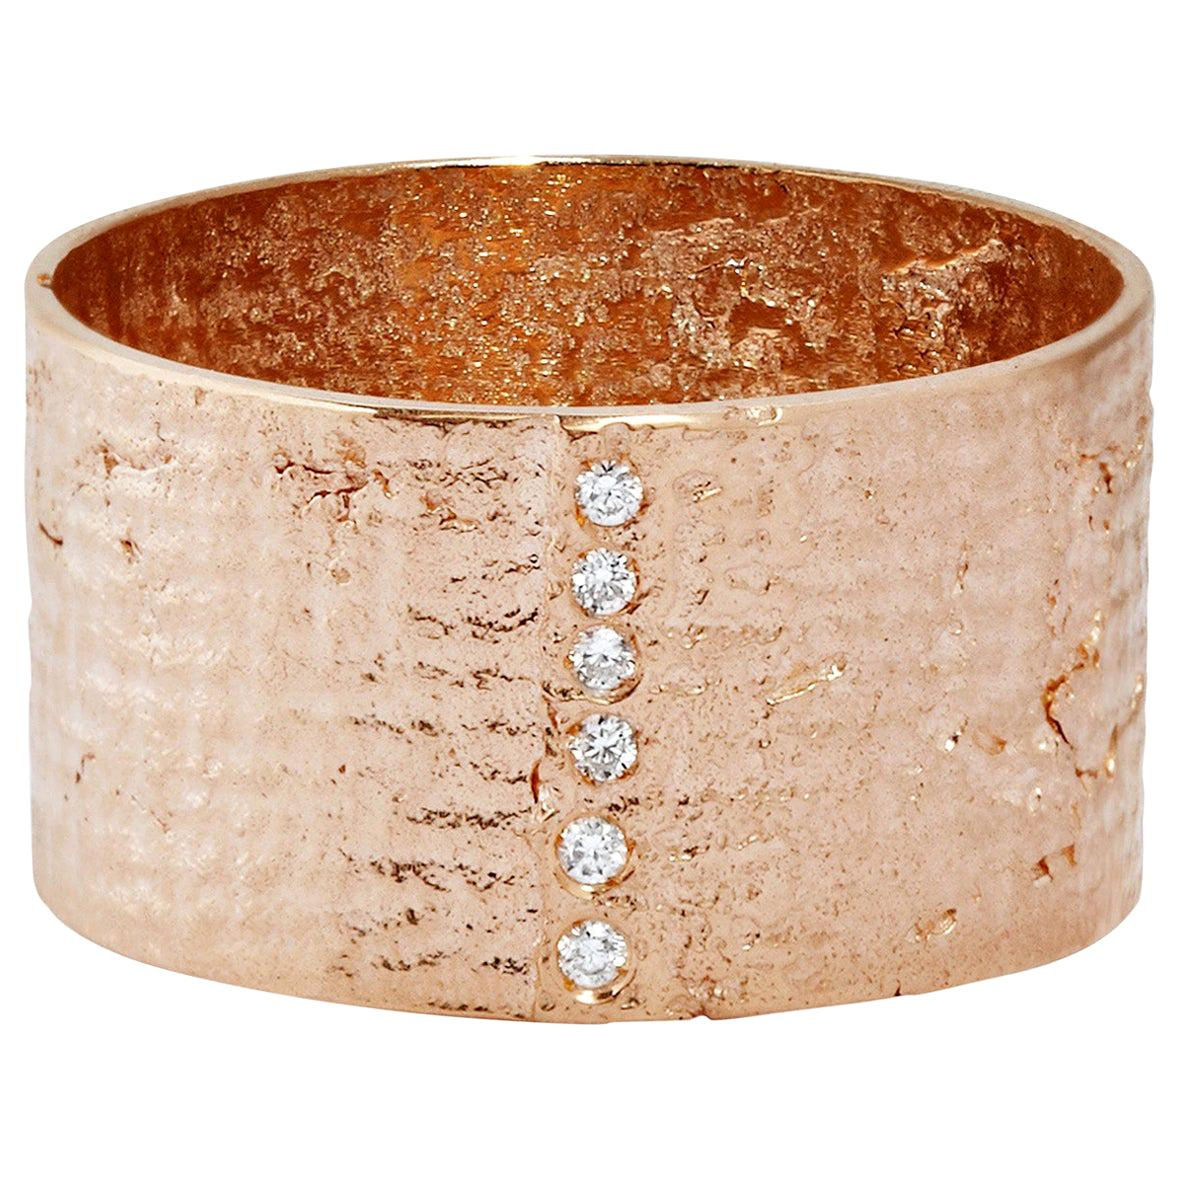 18 Karat Rose Gold Paper Cigar Ring with Diamonds by Allison Bryan